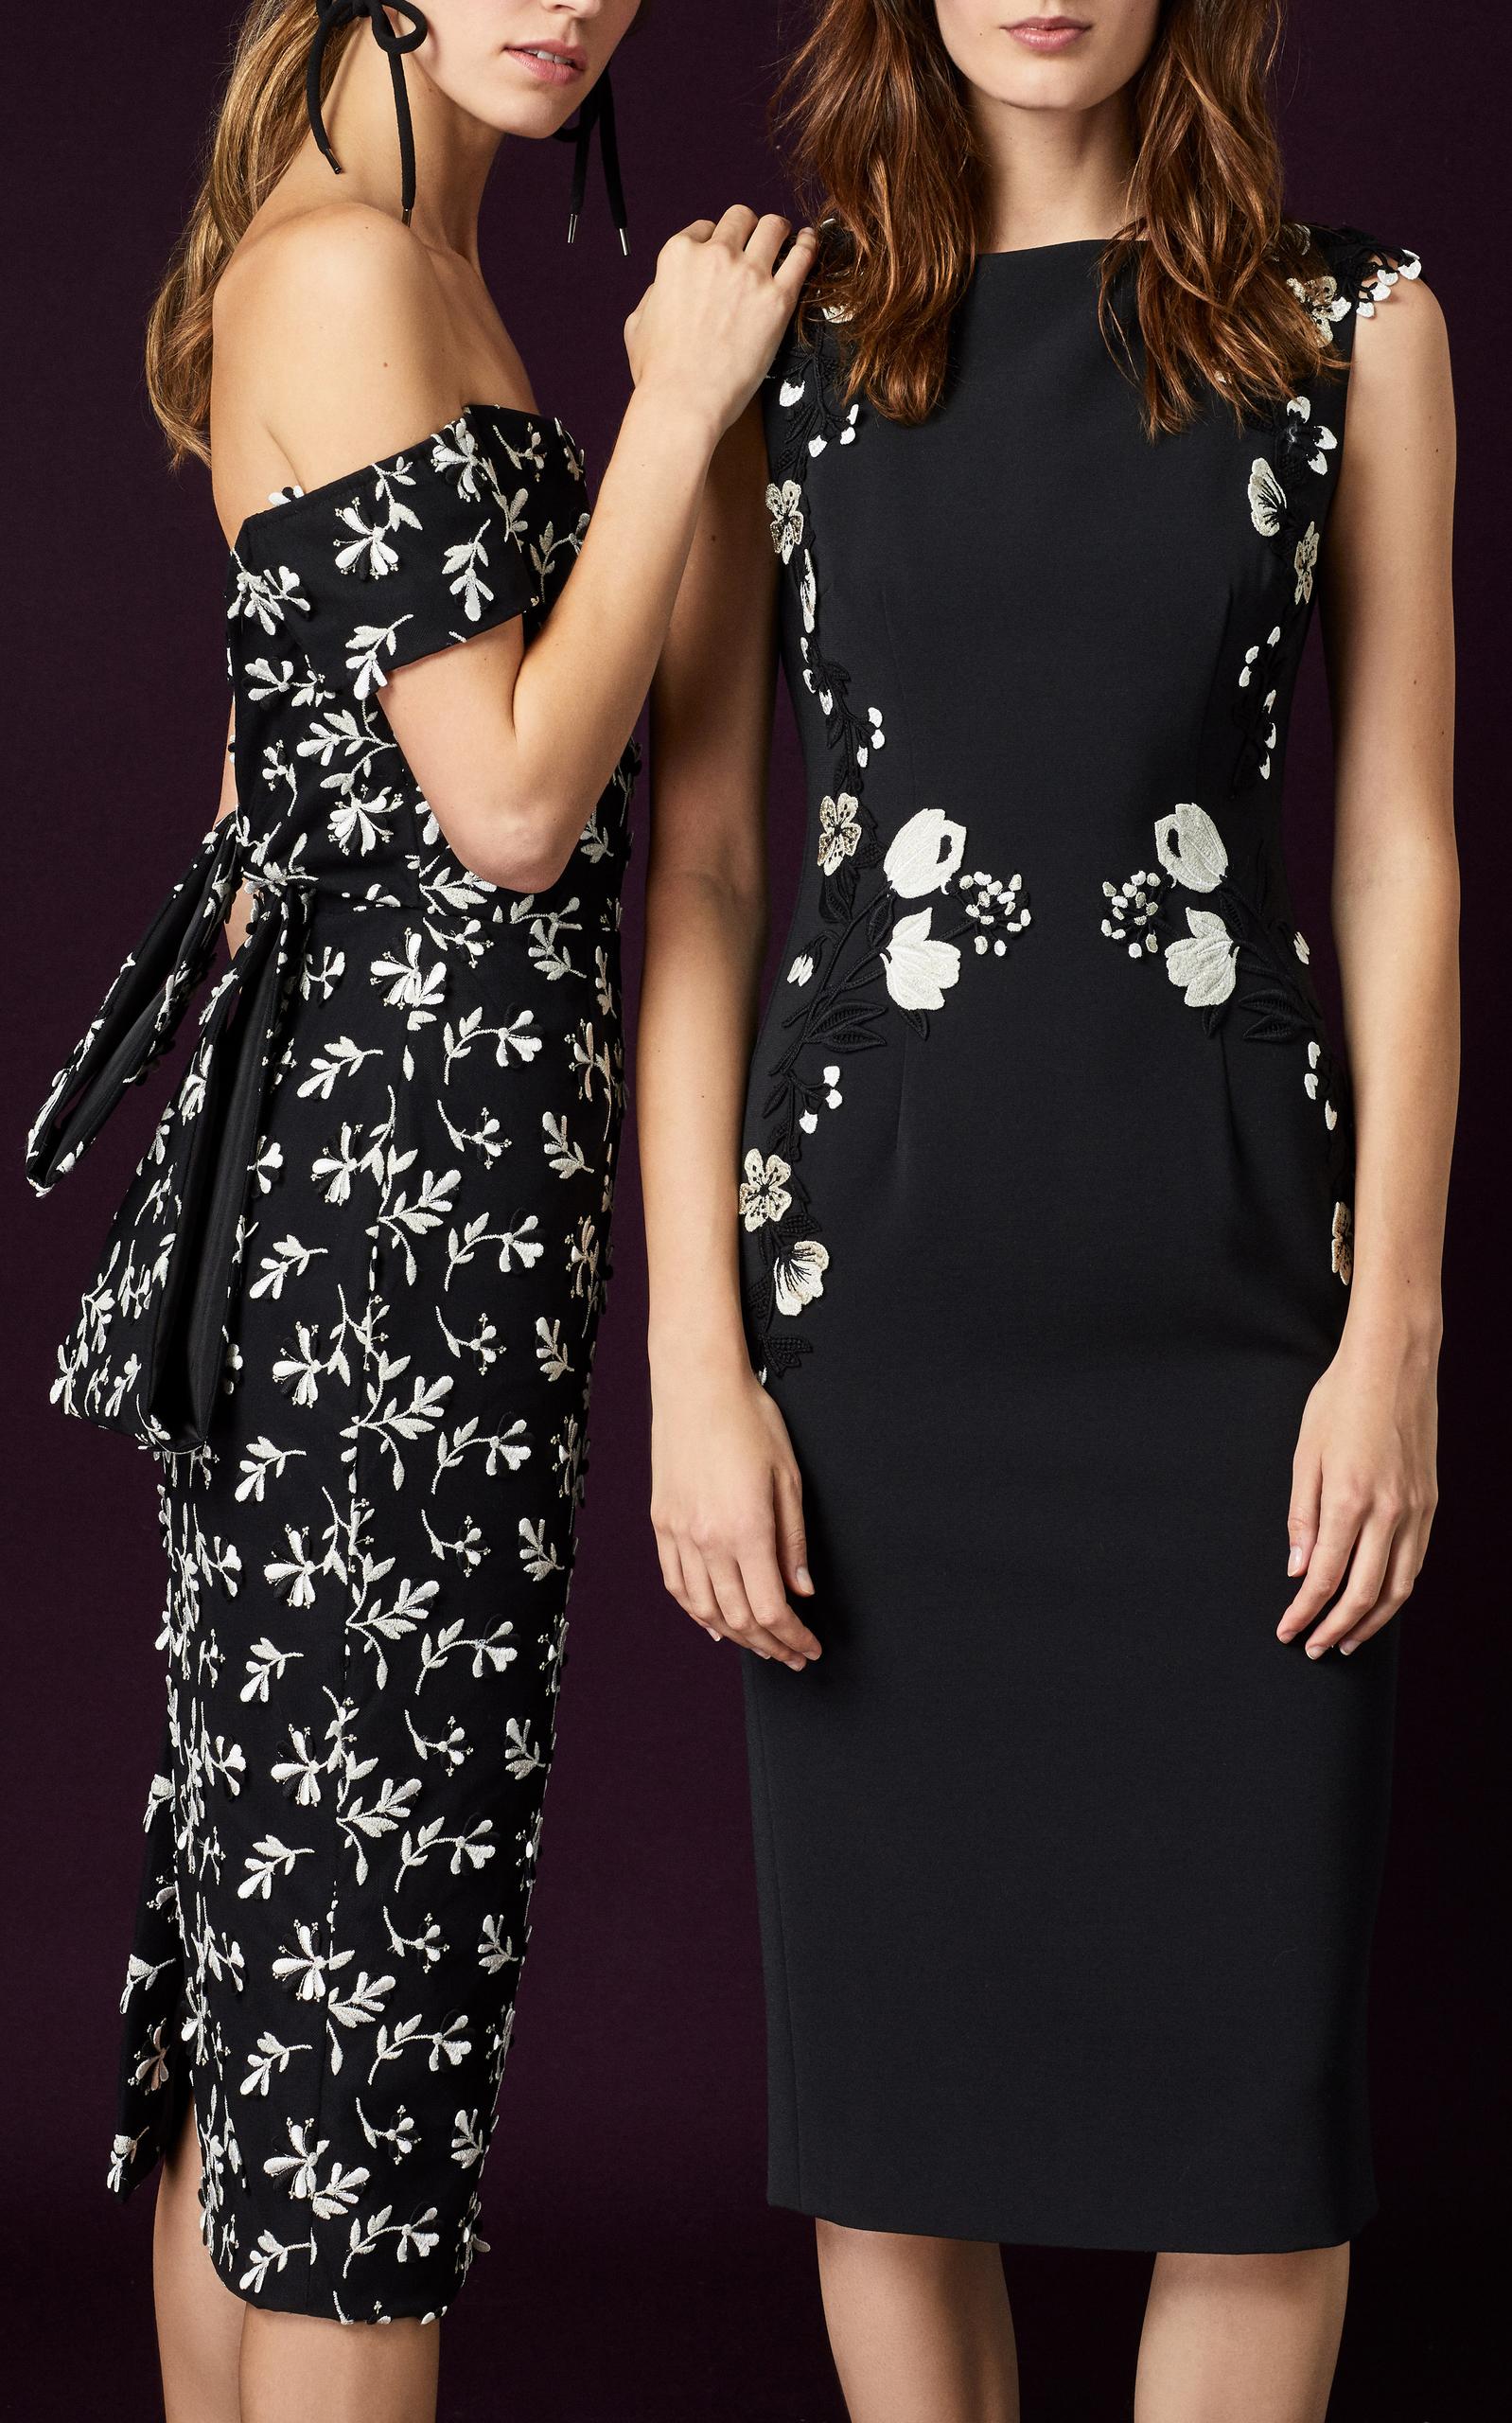 2f56a6b820fd Lela RoseOff-The-Shoulder Floral-Embroidered Crepe Dress. CLOSE. Loading.  Loading. Loading. Loading